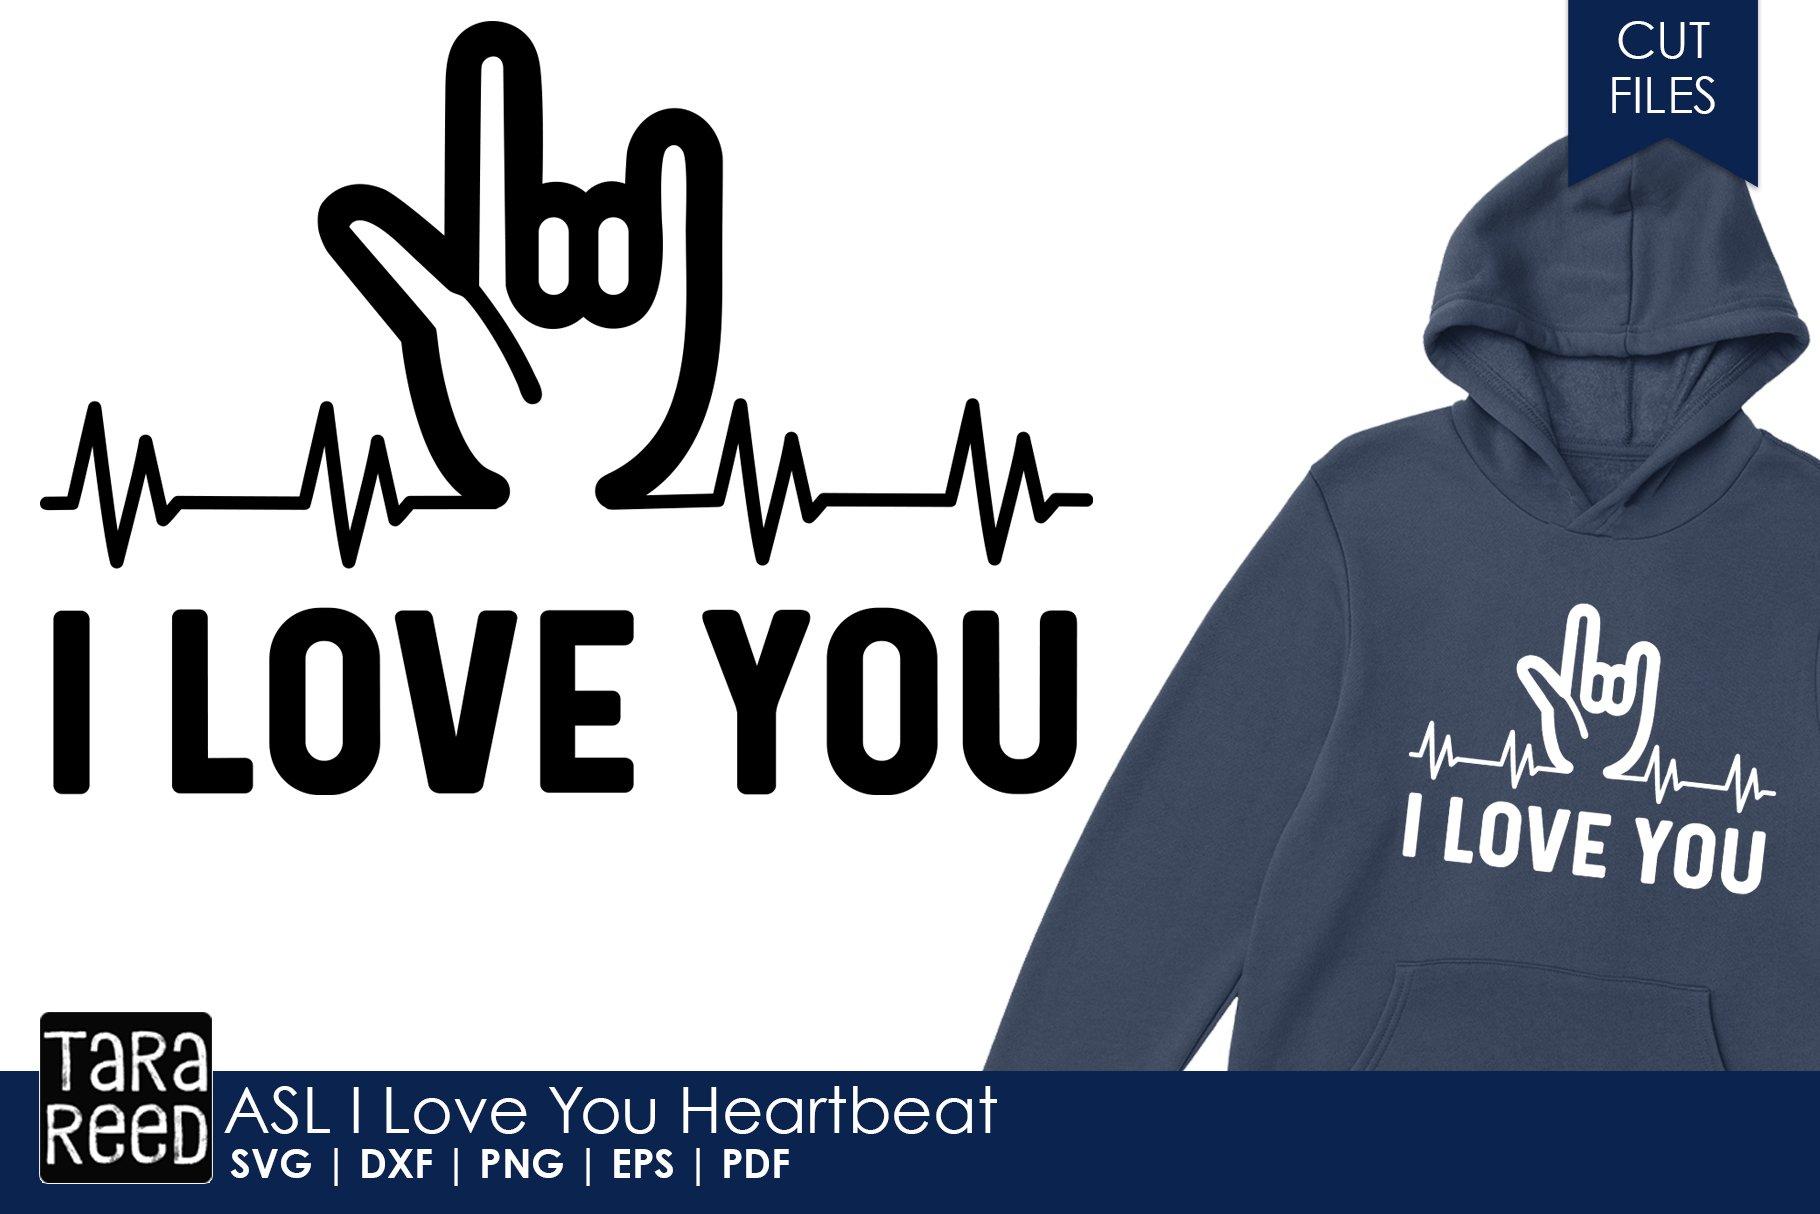 Asl I Love You Heartbeat Sign Language Svg Cut Files 451274 Cut Files Design Bundles